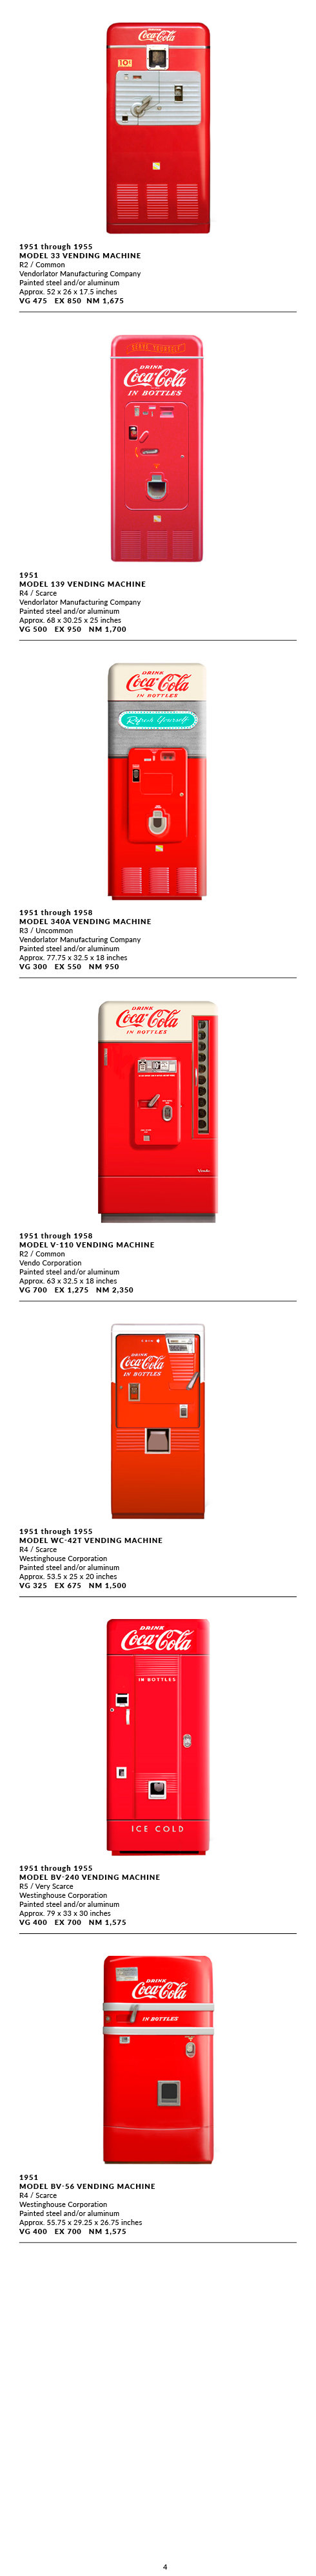 Vending Machines4.jpg